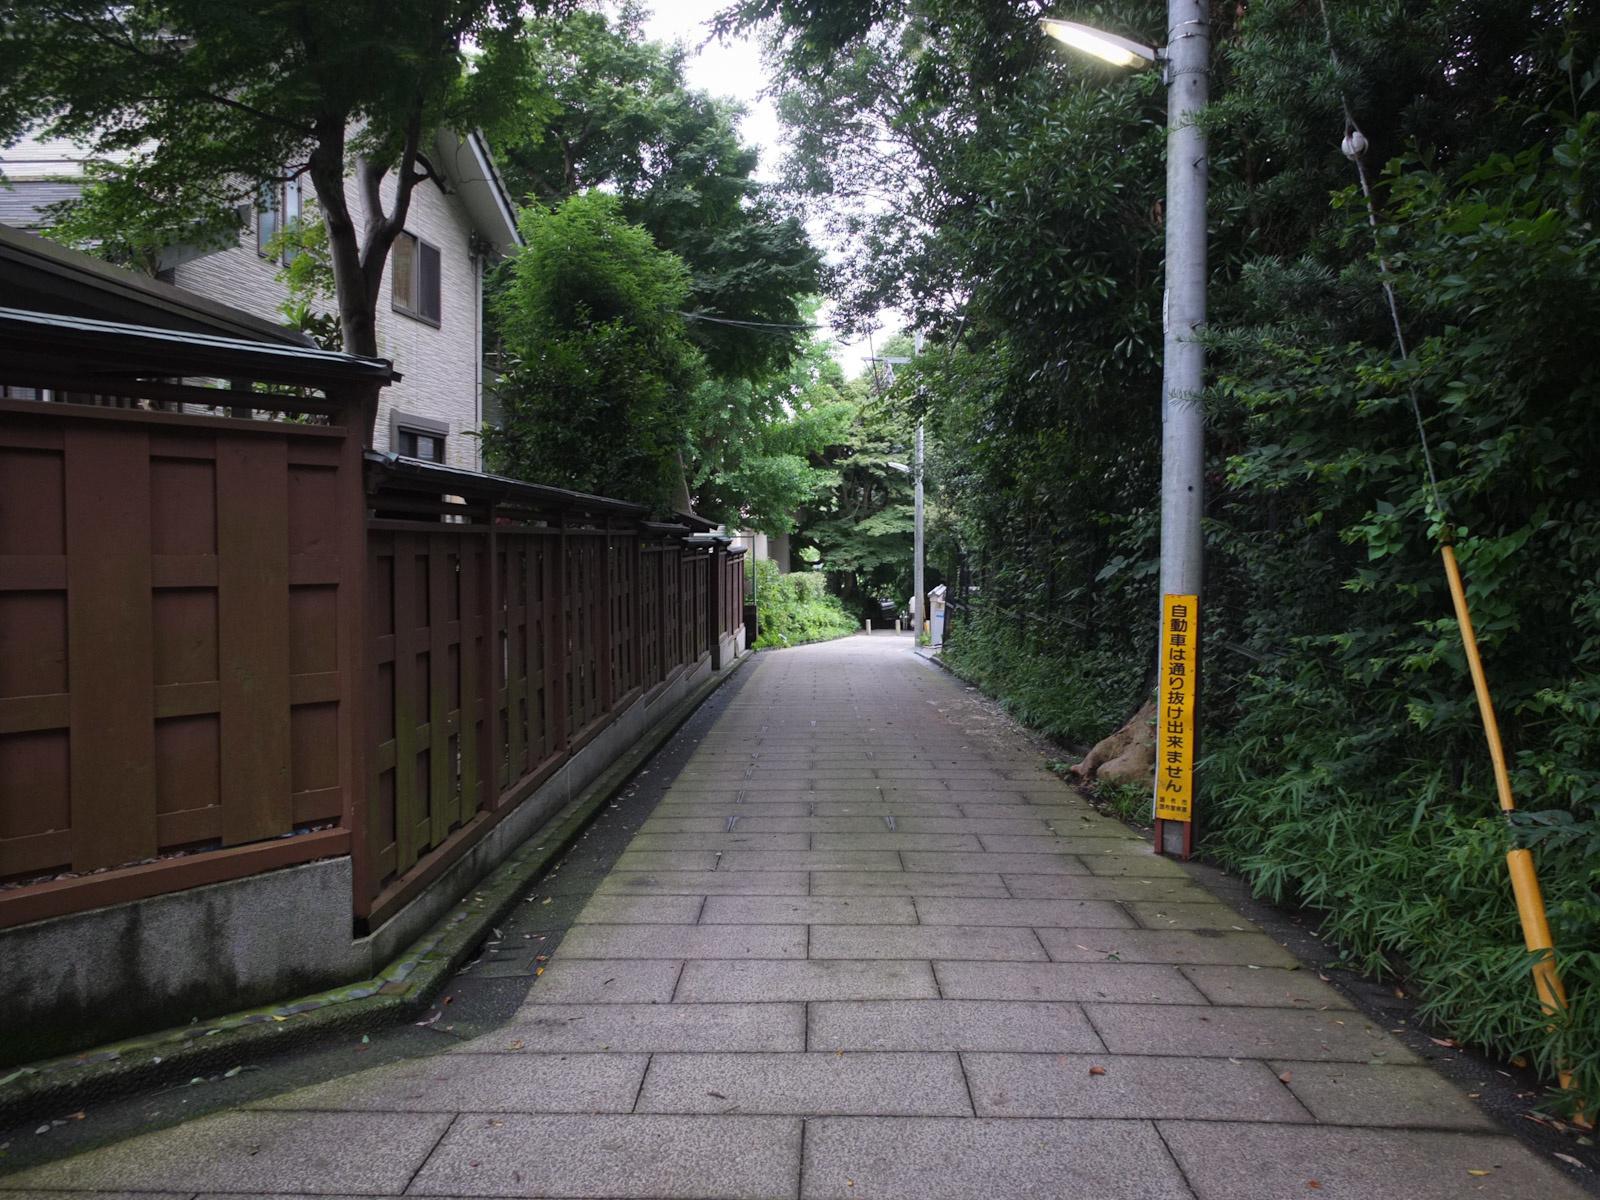 f:id:Yamadamado:20200706163711j:plain